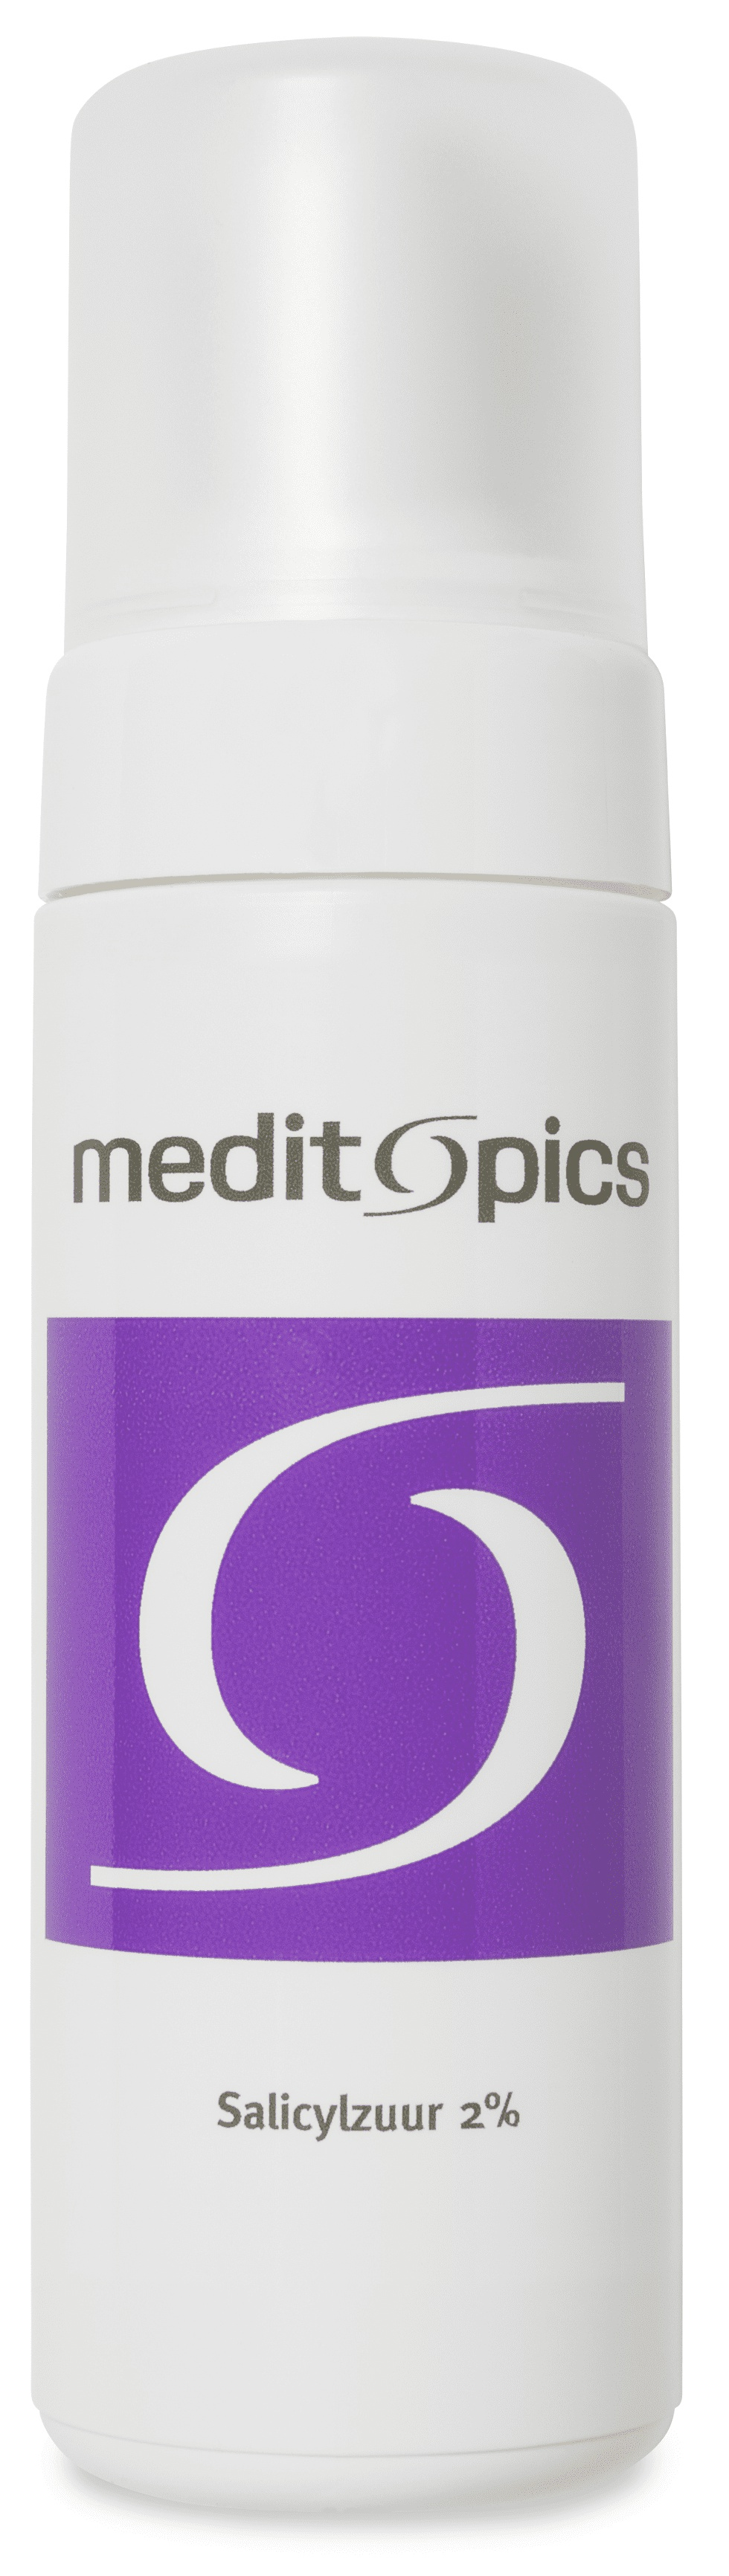 Meditopics Salicylzuur 2%